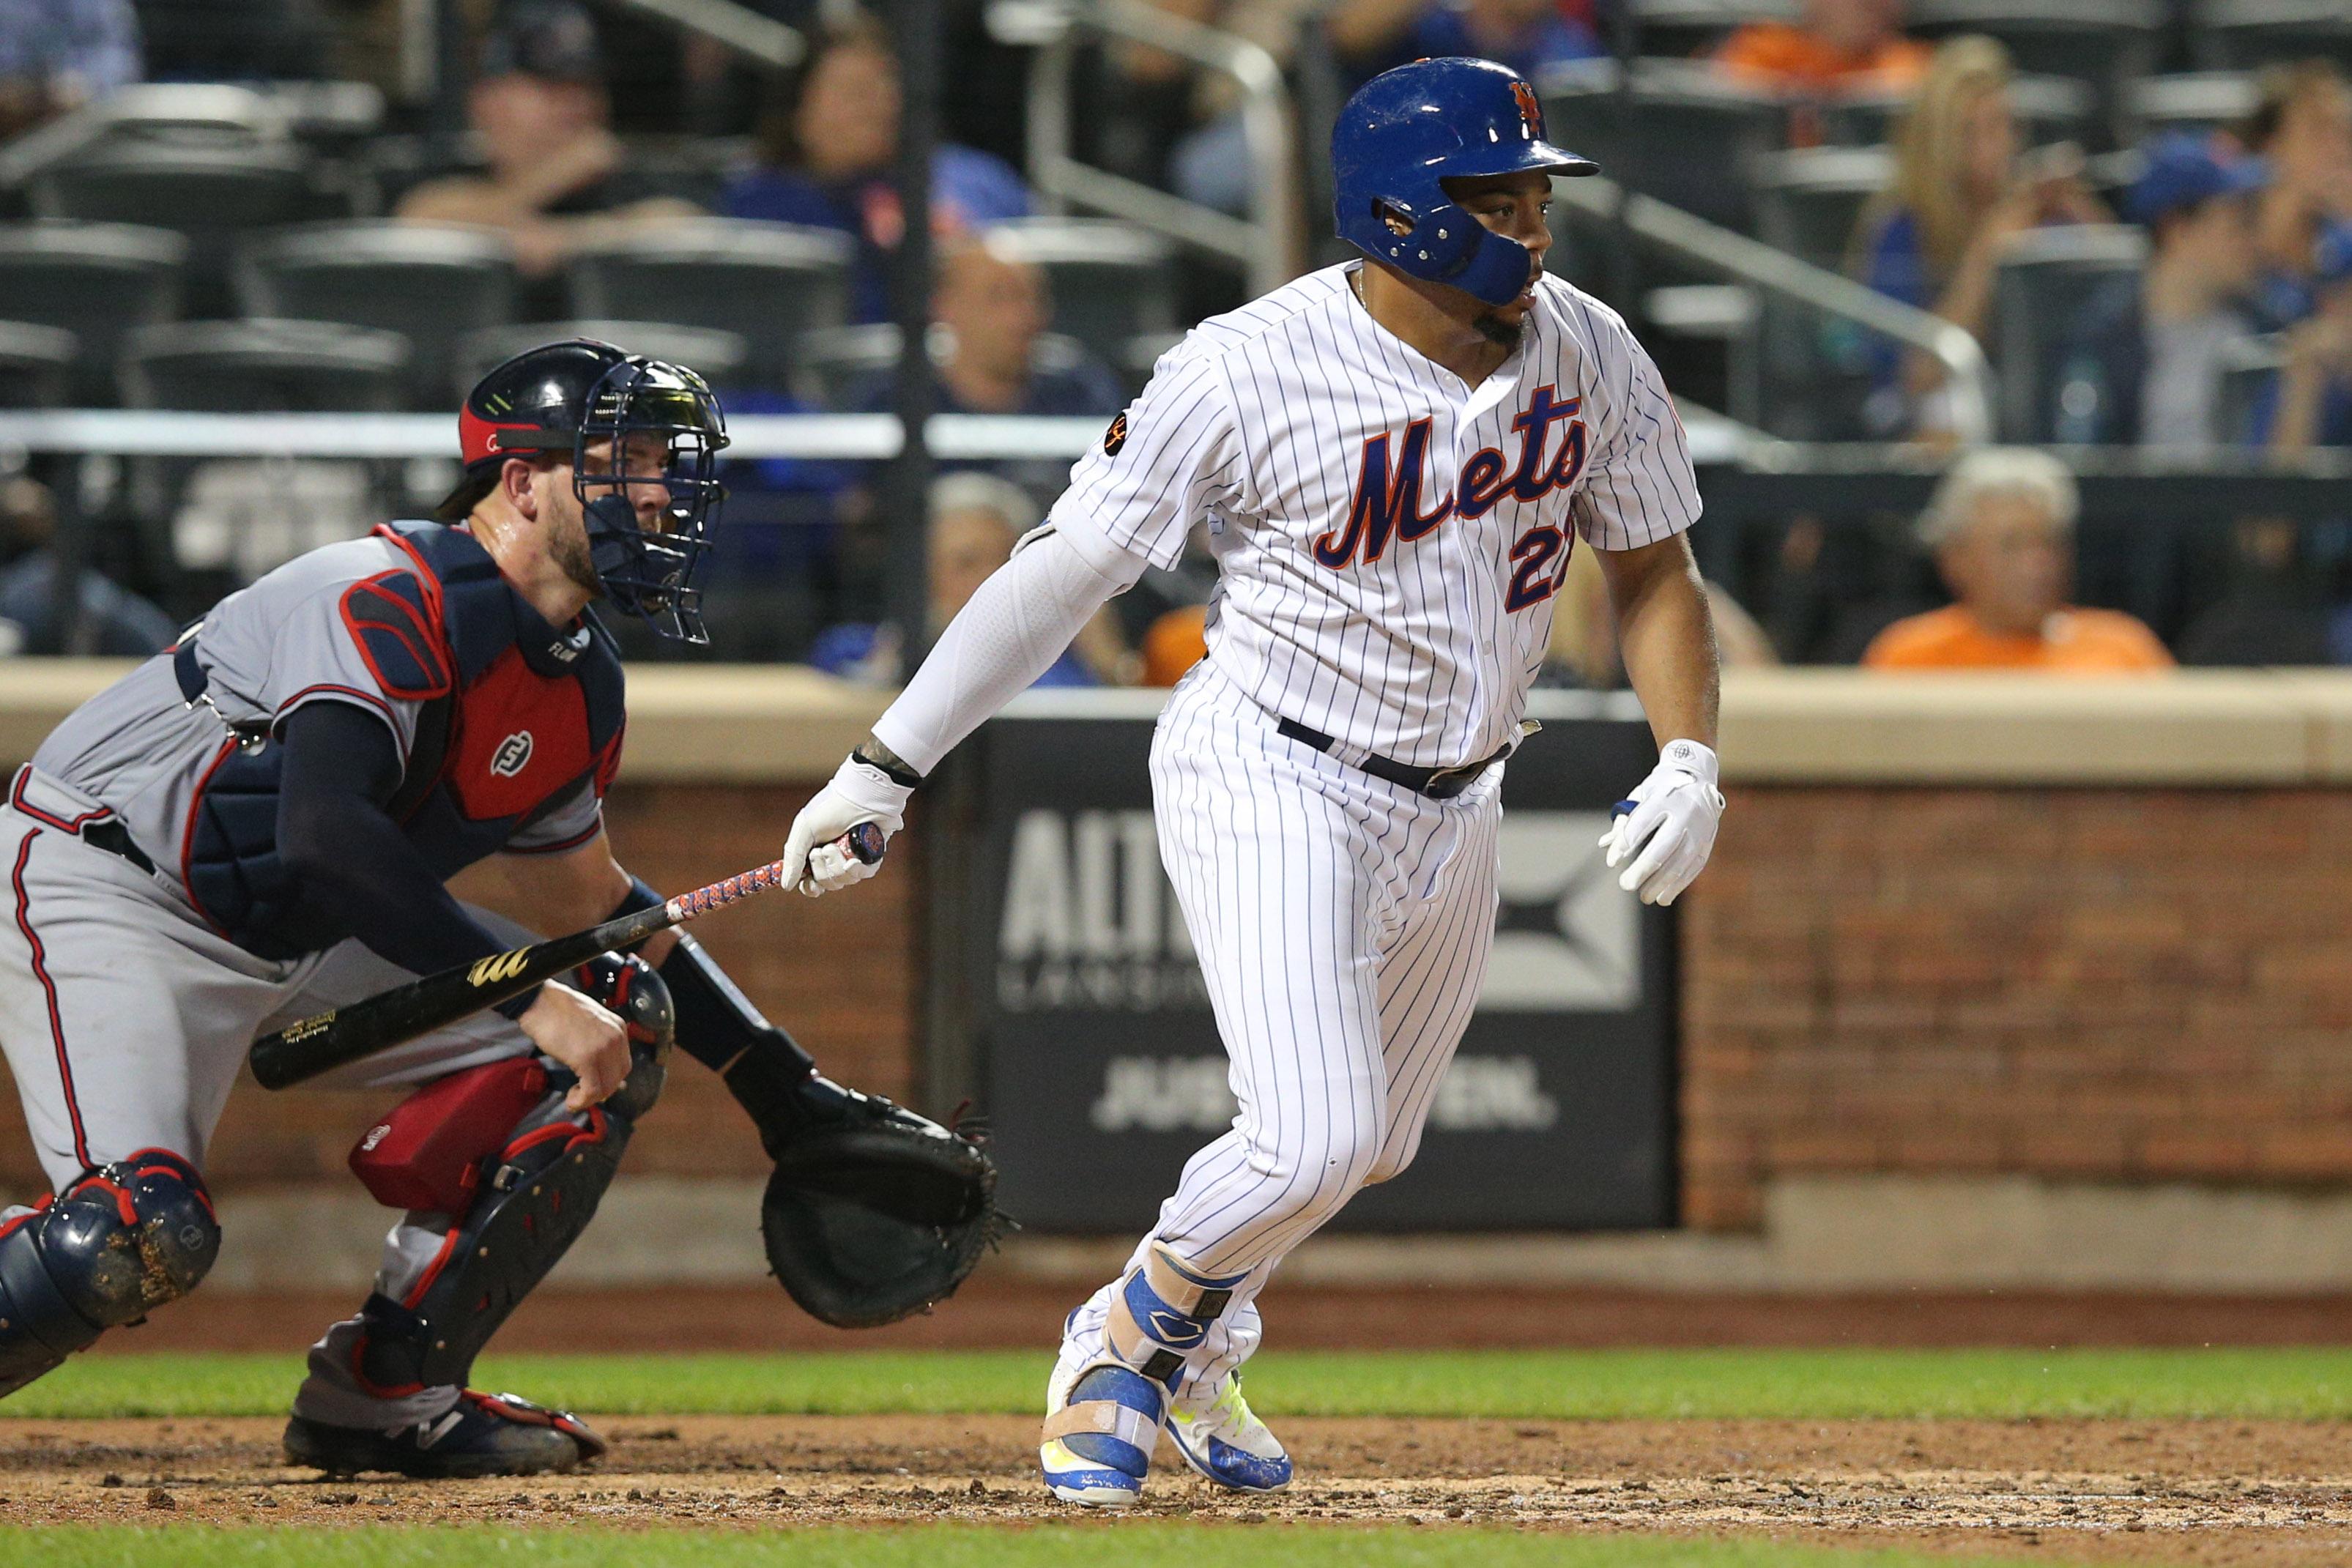 9/27/18 Game Preview: Atlanta Braves at New York Mets